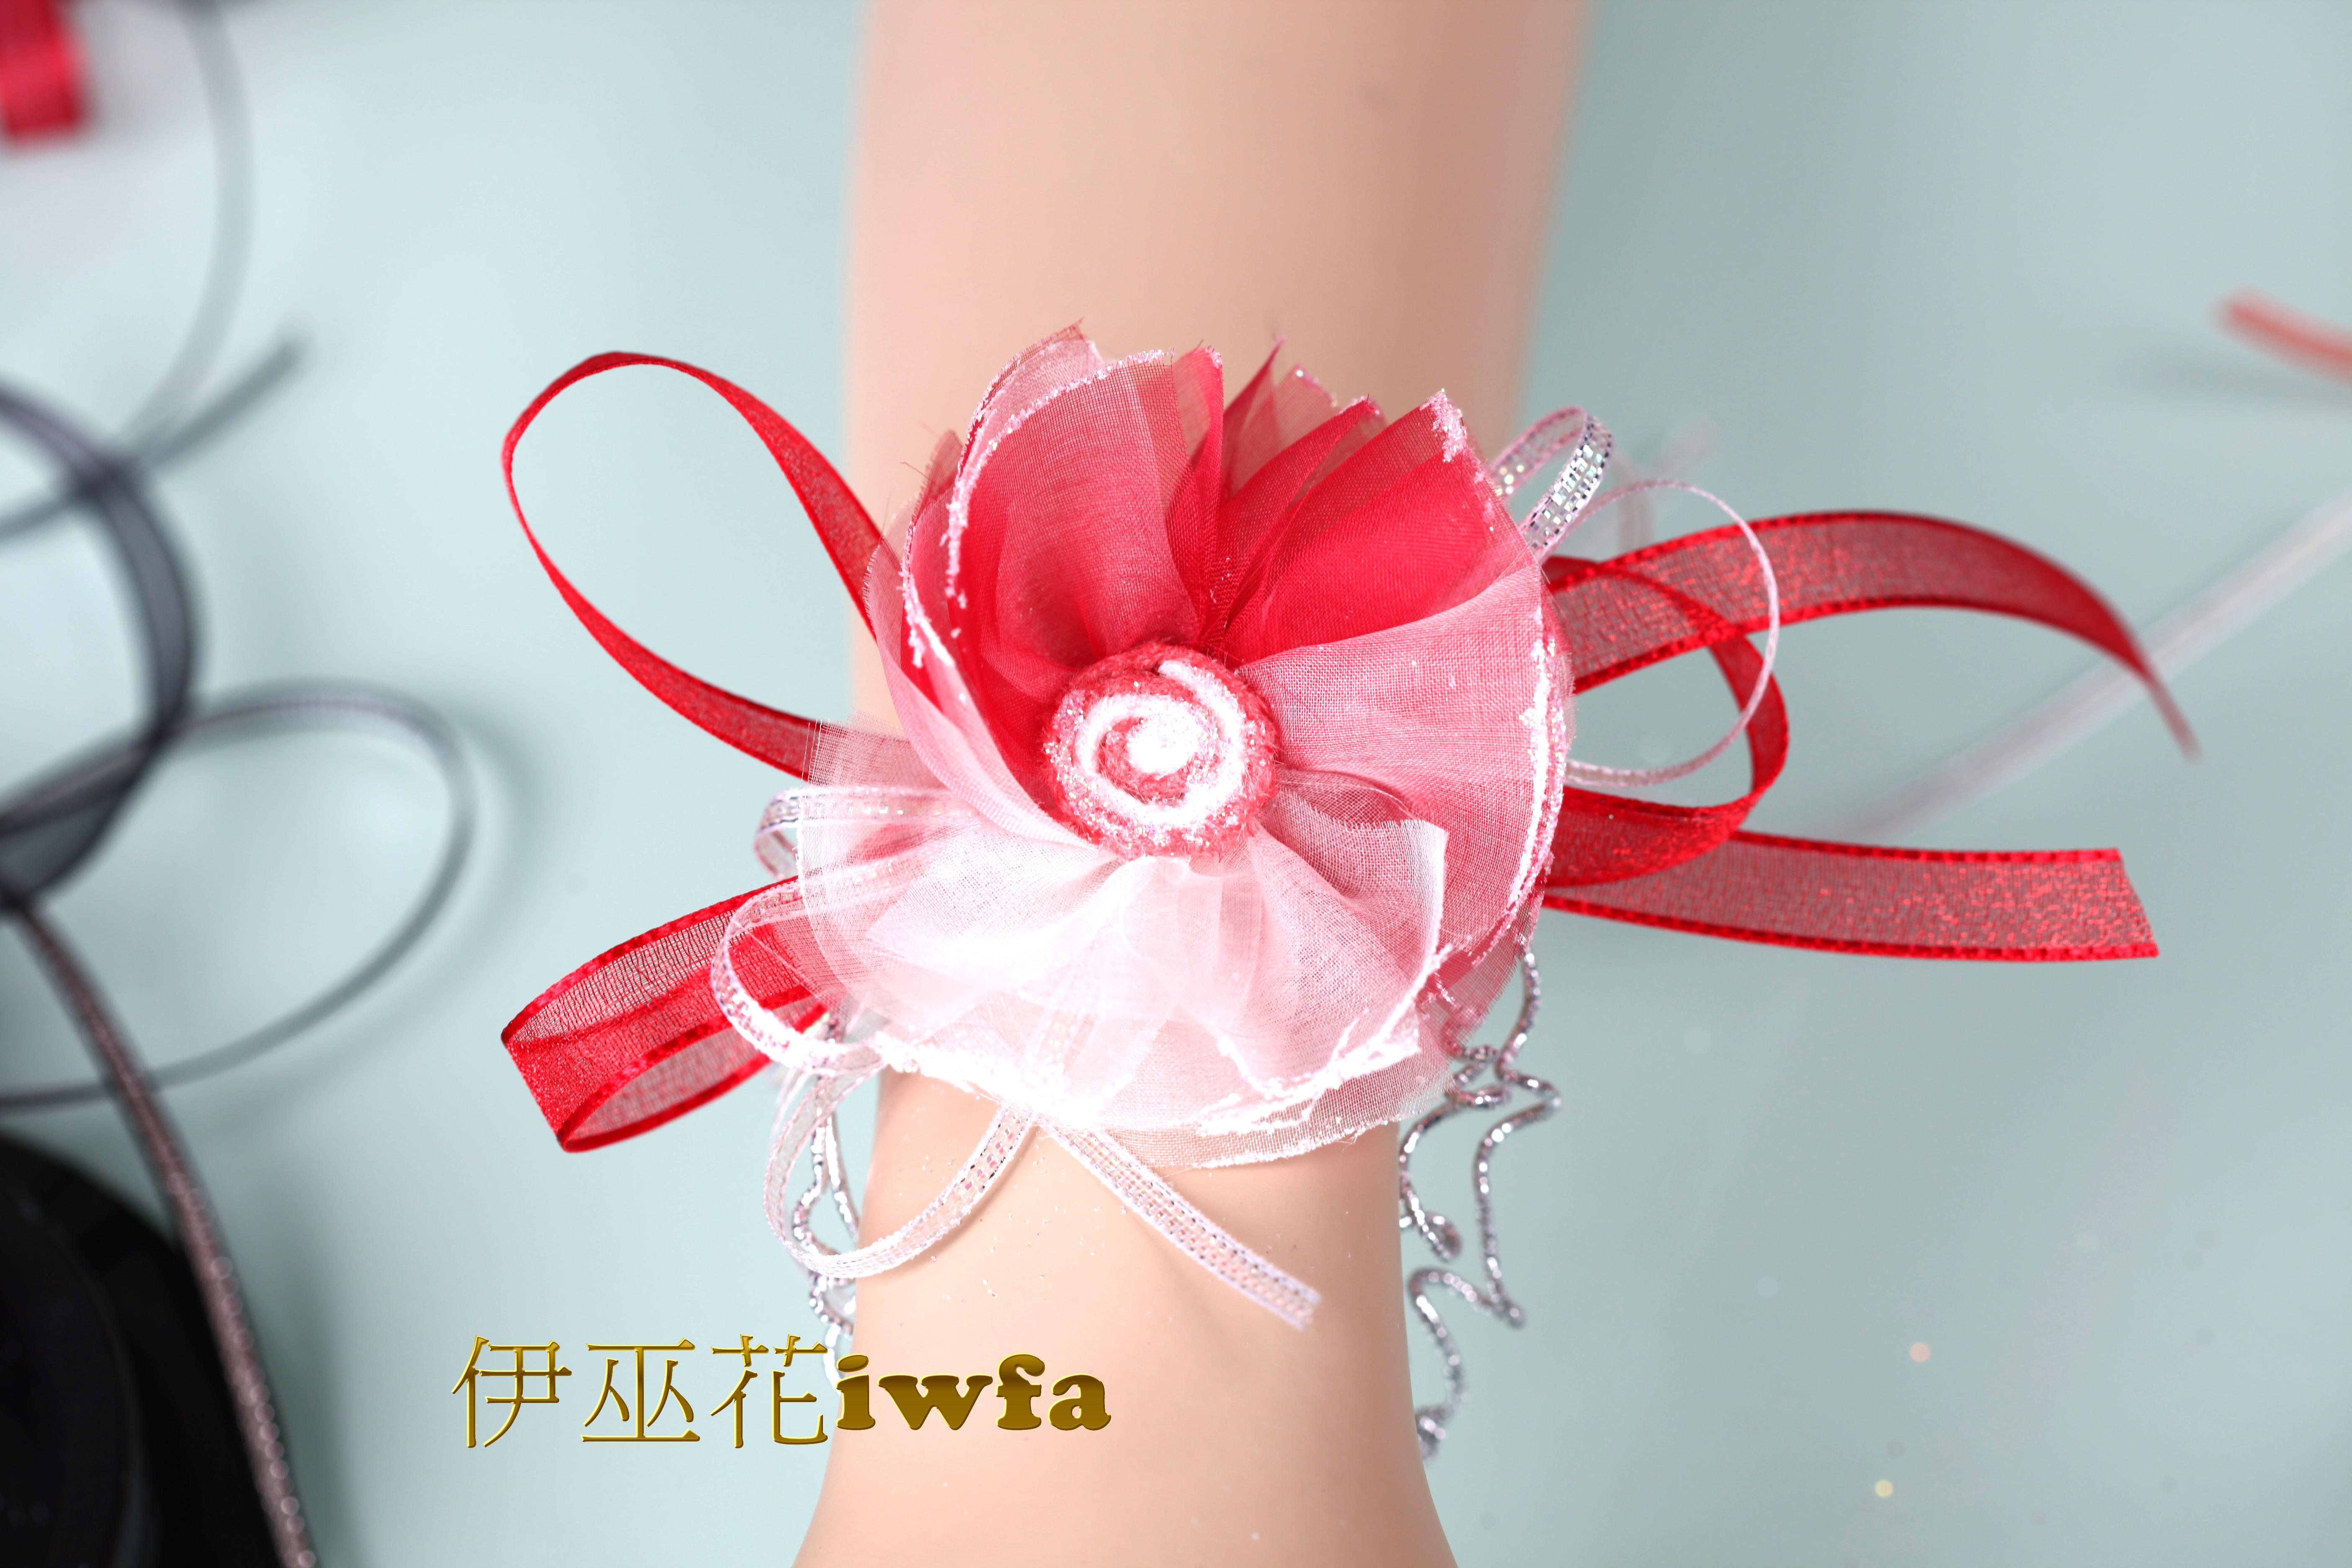 WR015-01 抽象向日葵-紅色+粉色